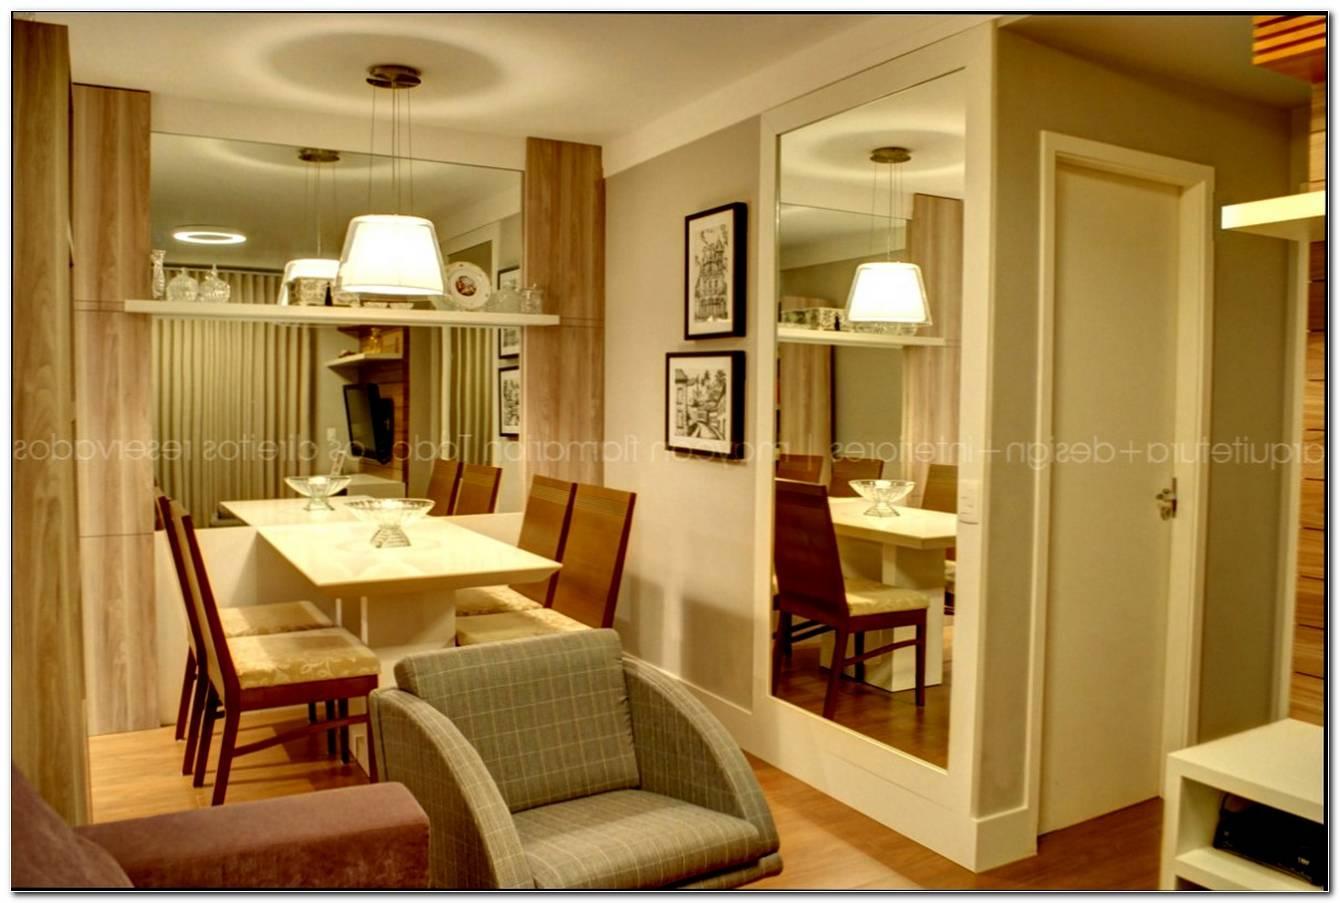 Fotos De Sala De Estar De Apartamento Pequeno